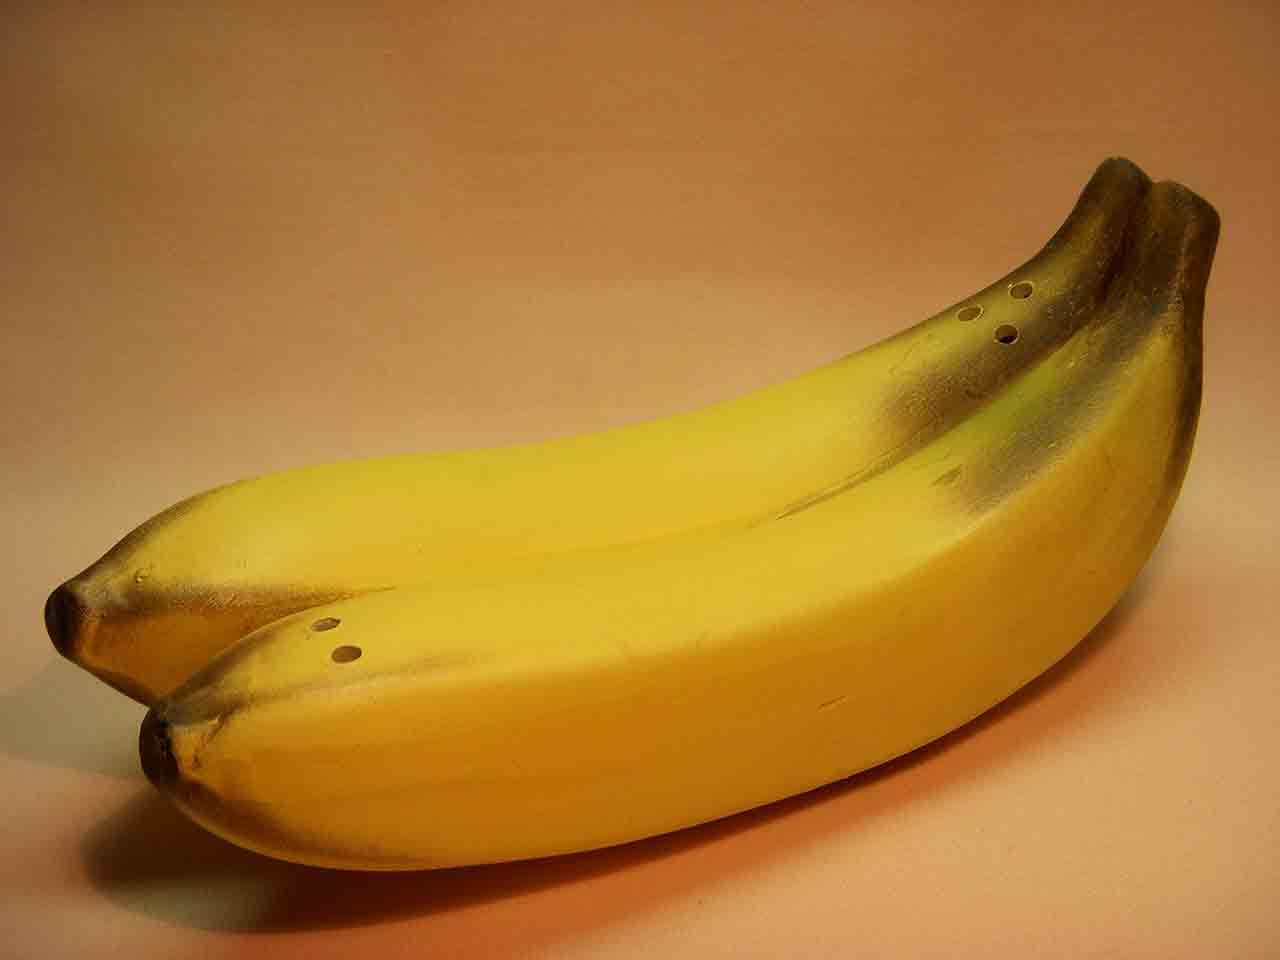 One piece bananas salt and pepper shaker